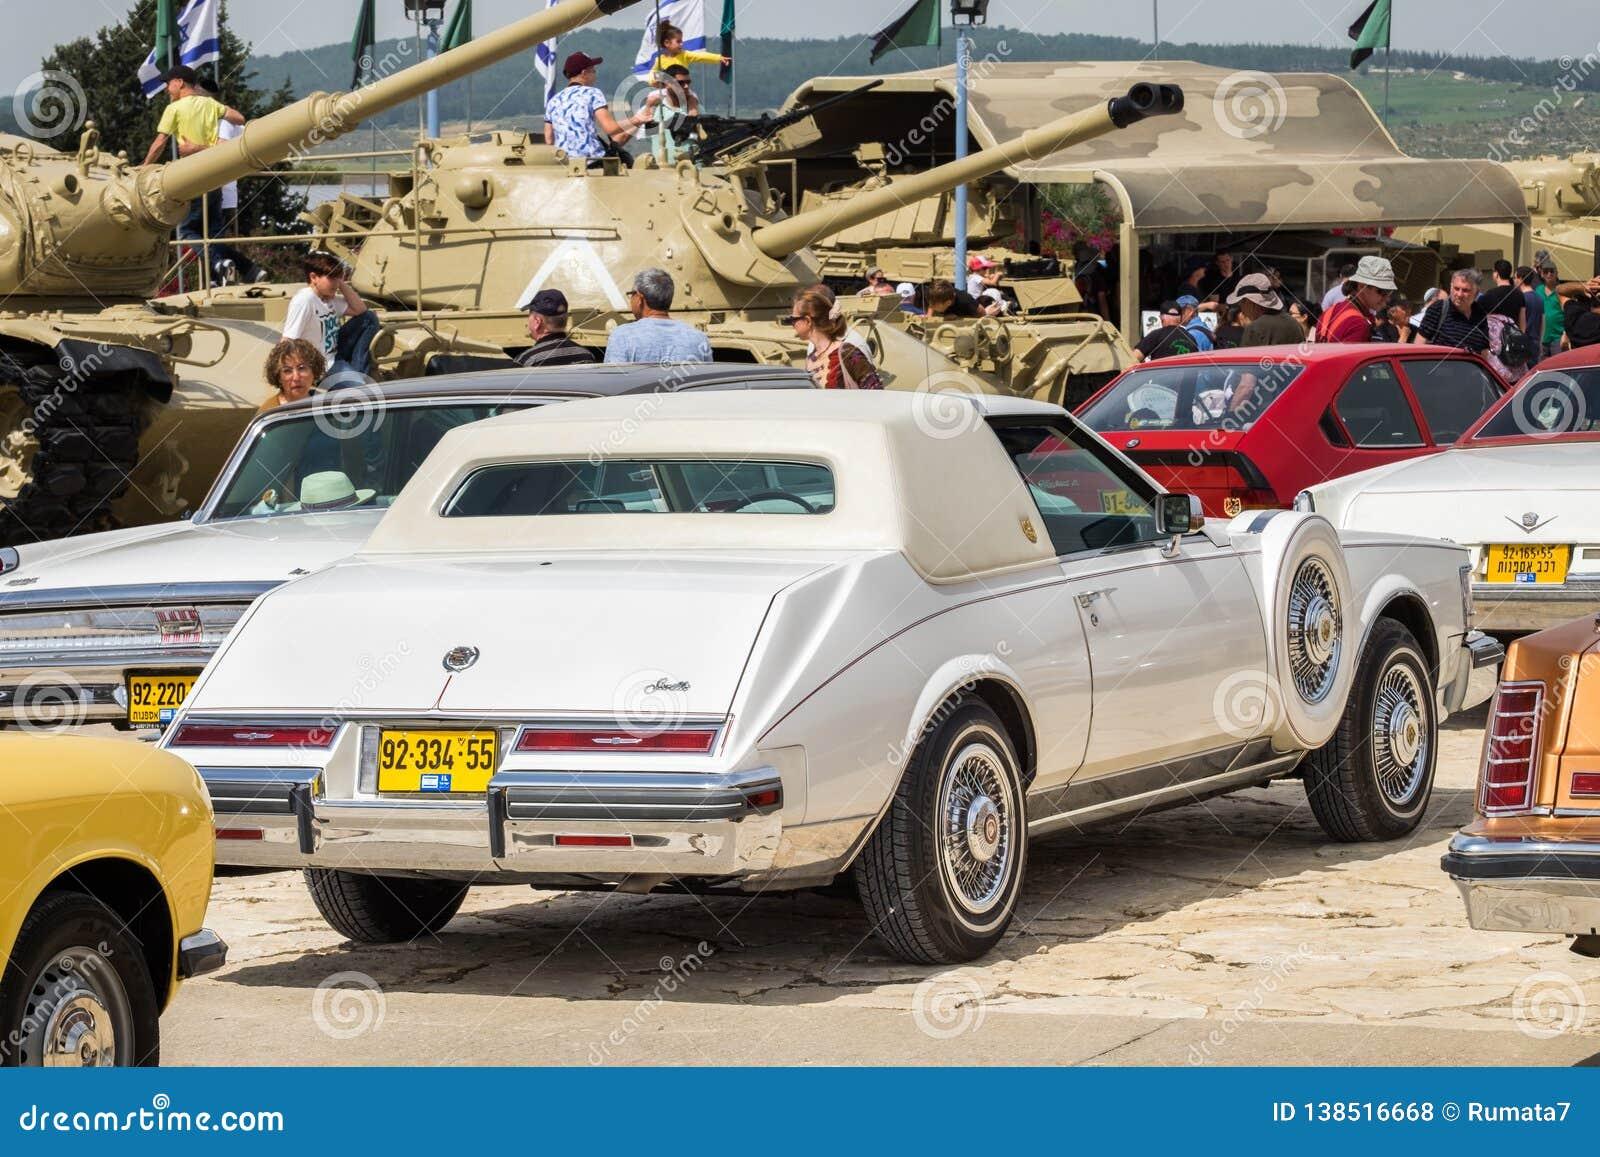 Vintage White Oldsmobile Seville 1970s Presented On Car Show